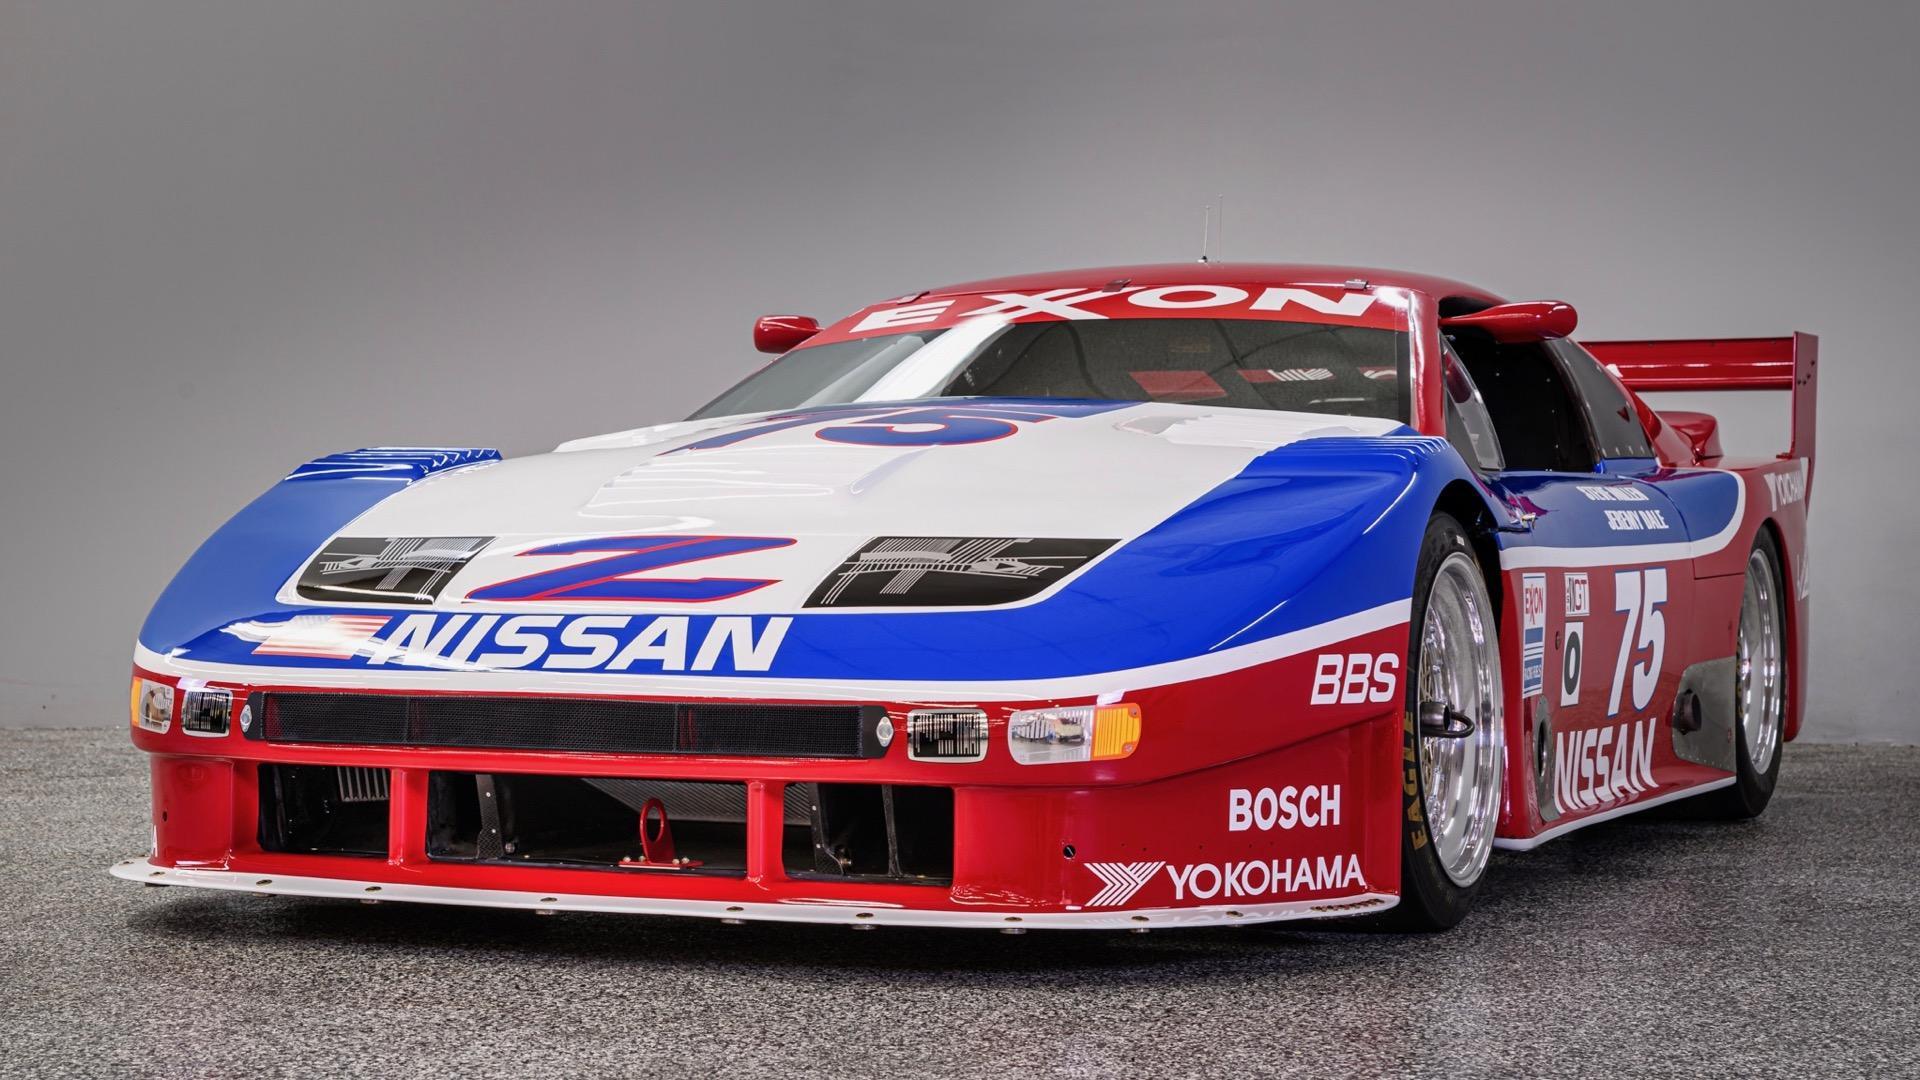 1990 nissan 300zx twin turbo imsa gto race car photo by bring a trailer 100791722 h